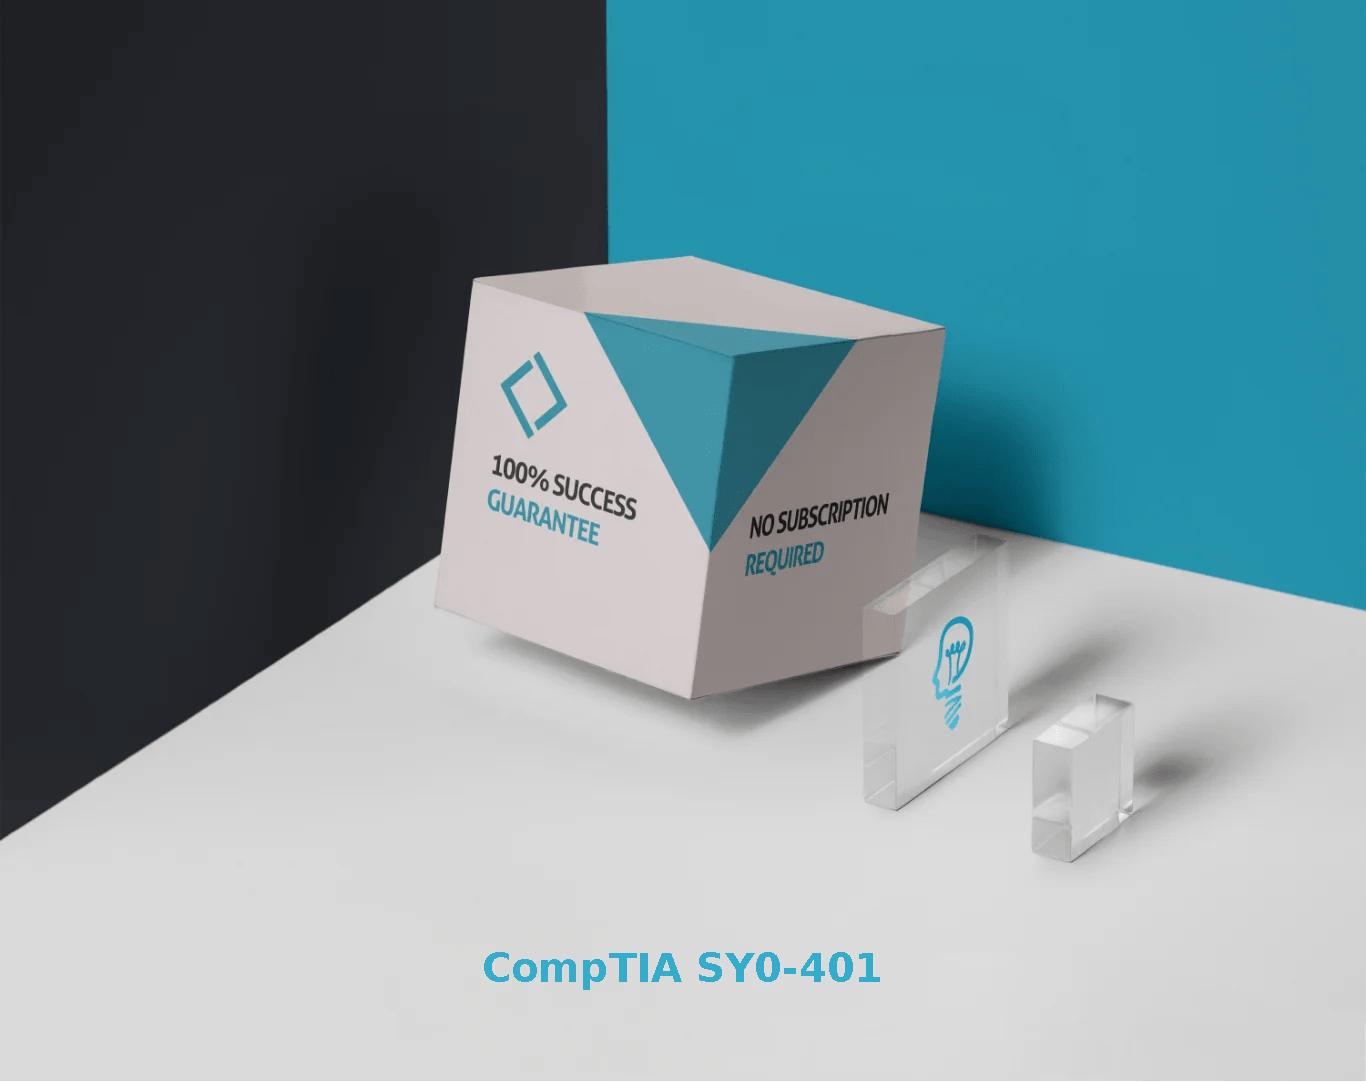 CompTIA SY0-401 Exams